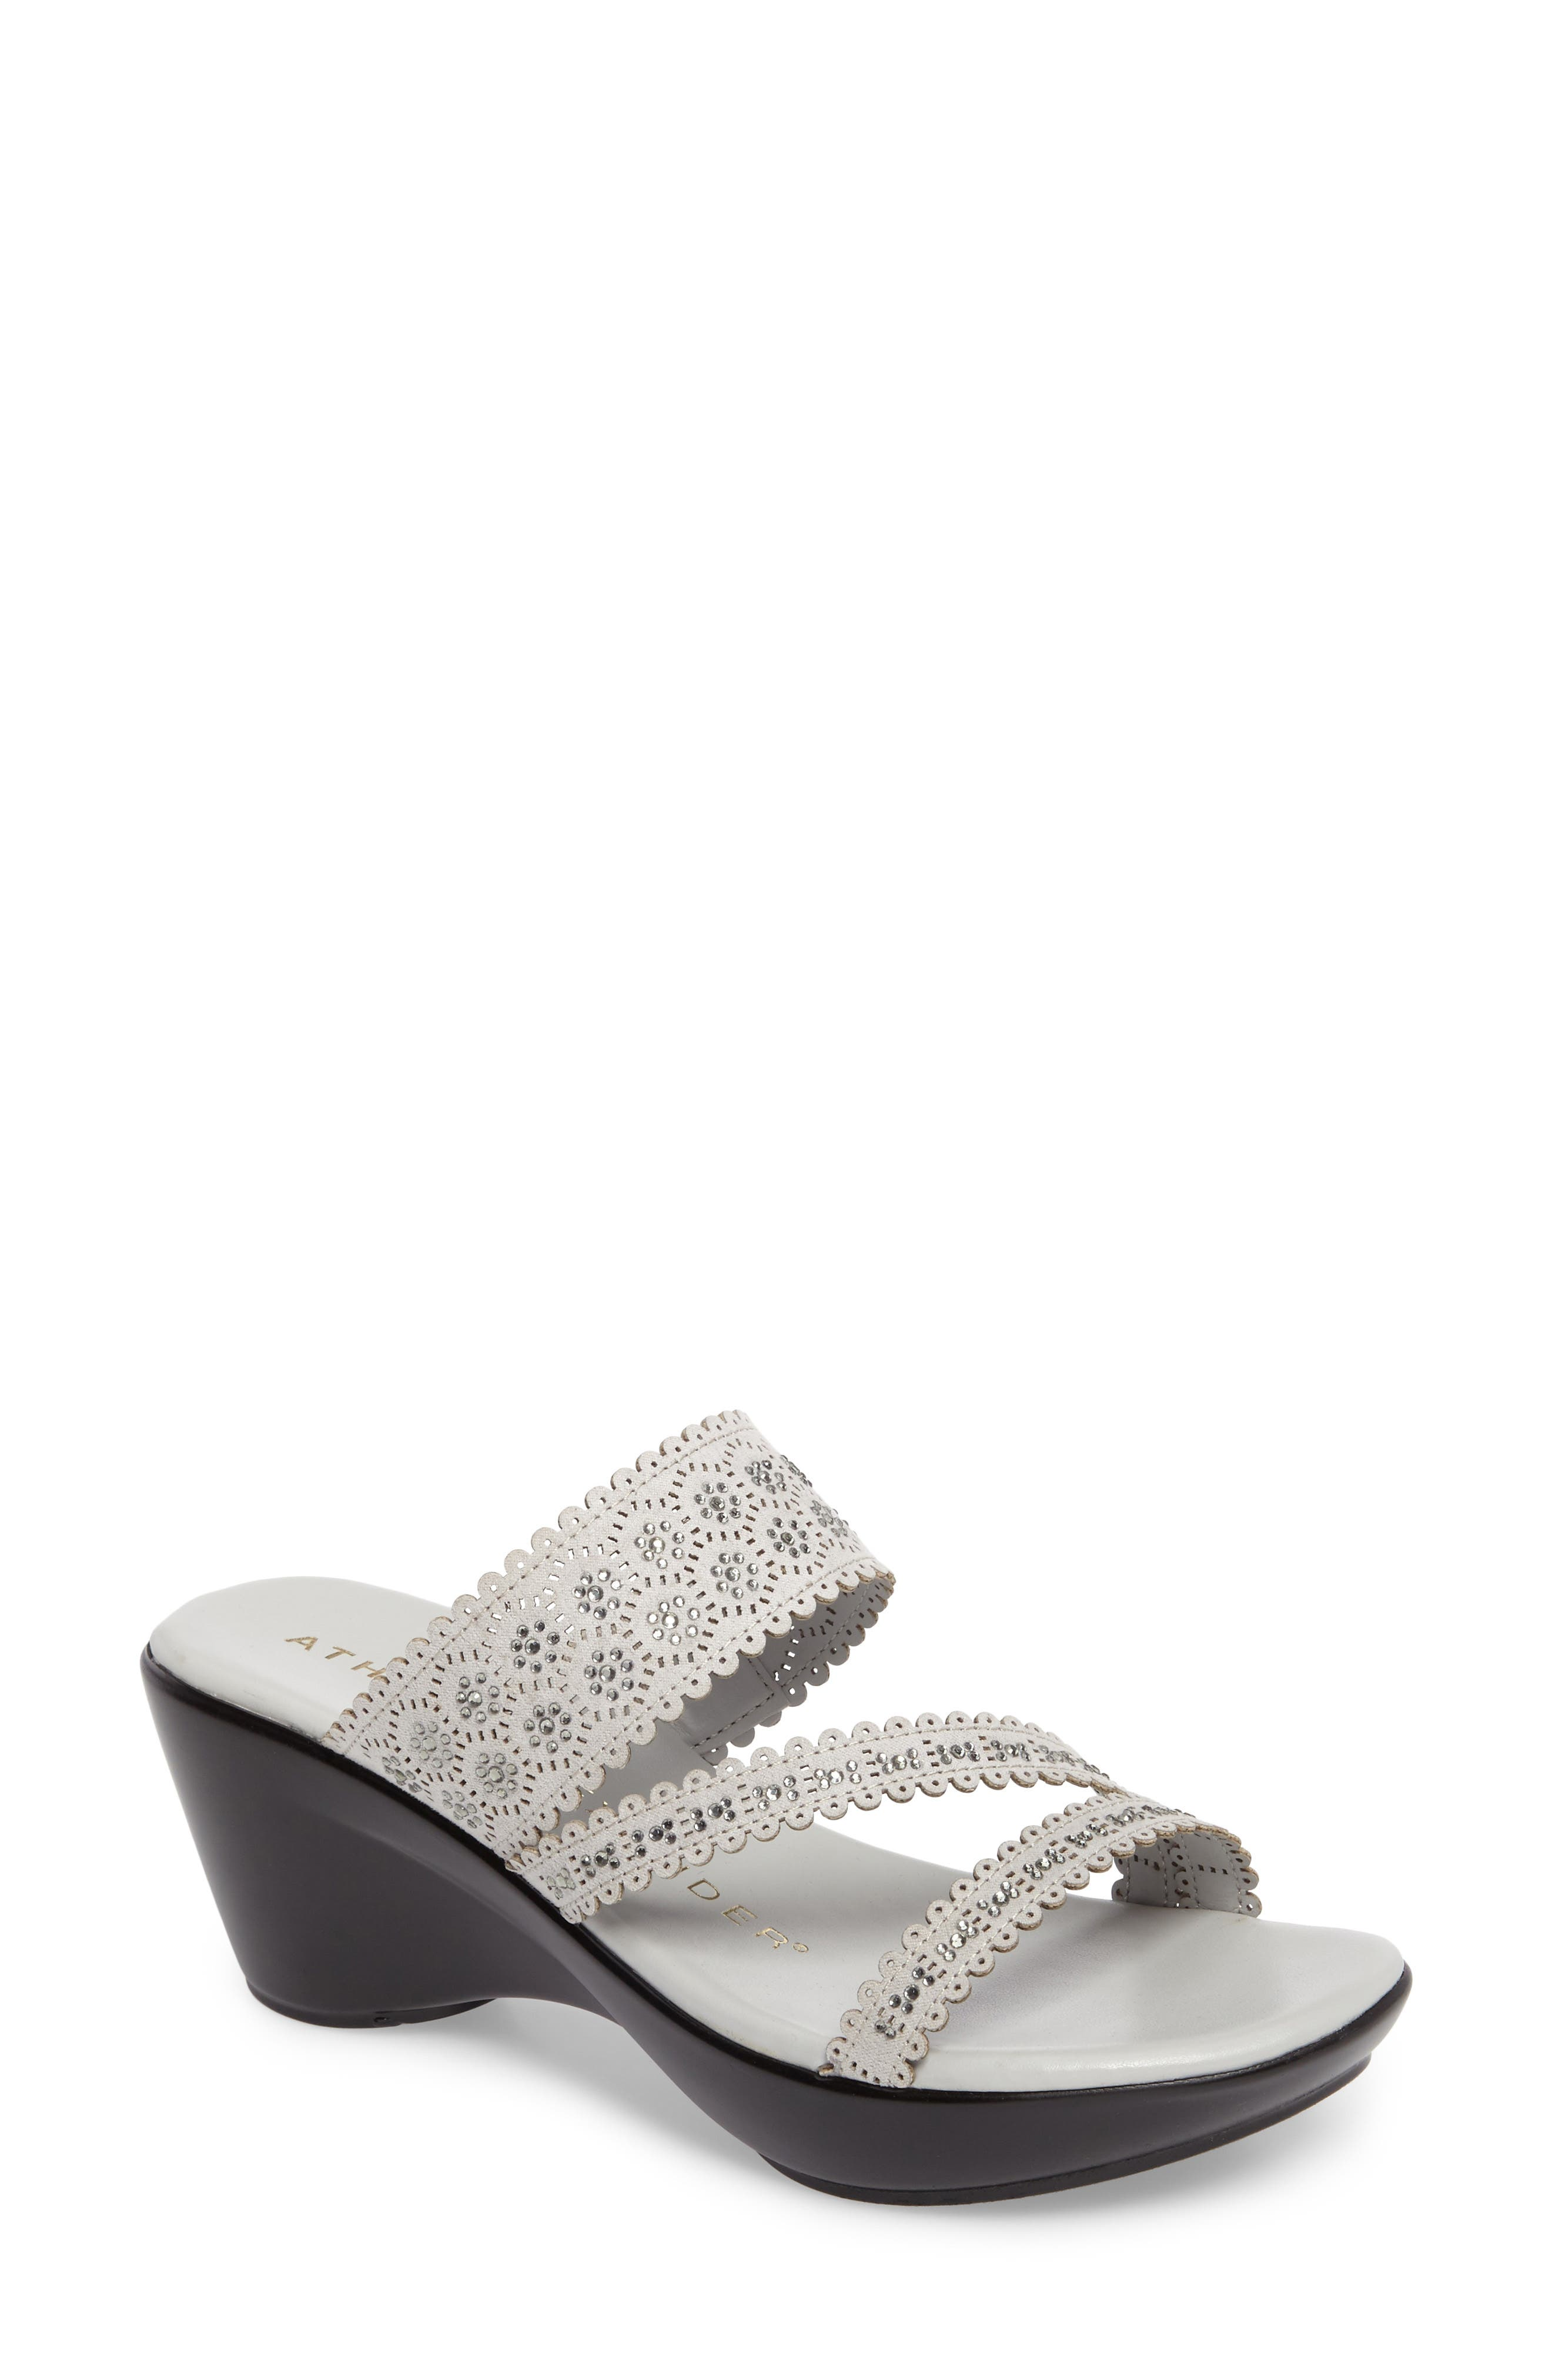 Alternate Image 1 Selected - Athena Alexander Poppy Wedge Sandal (Women)